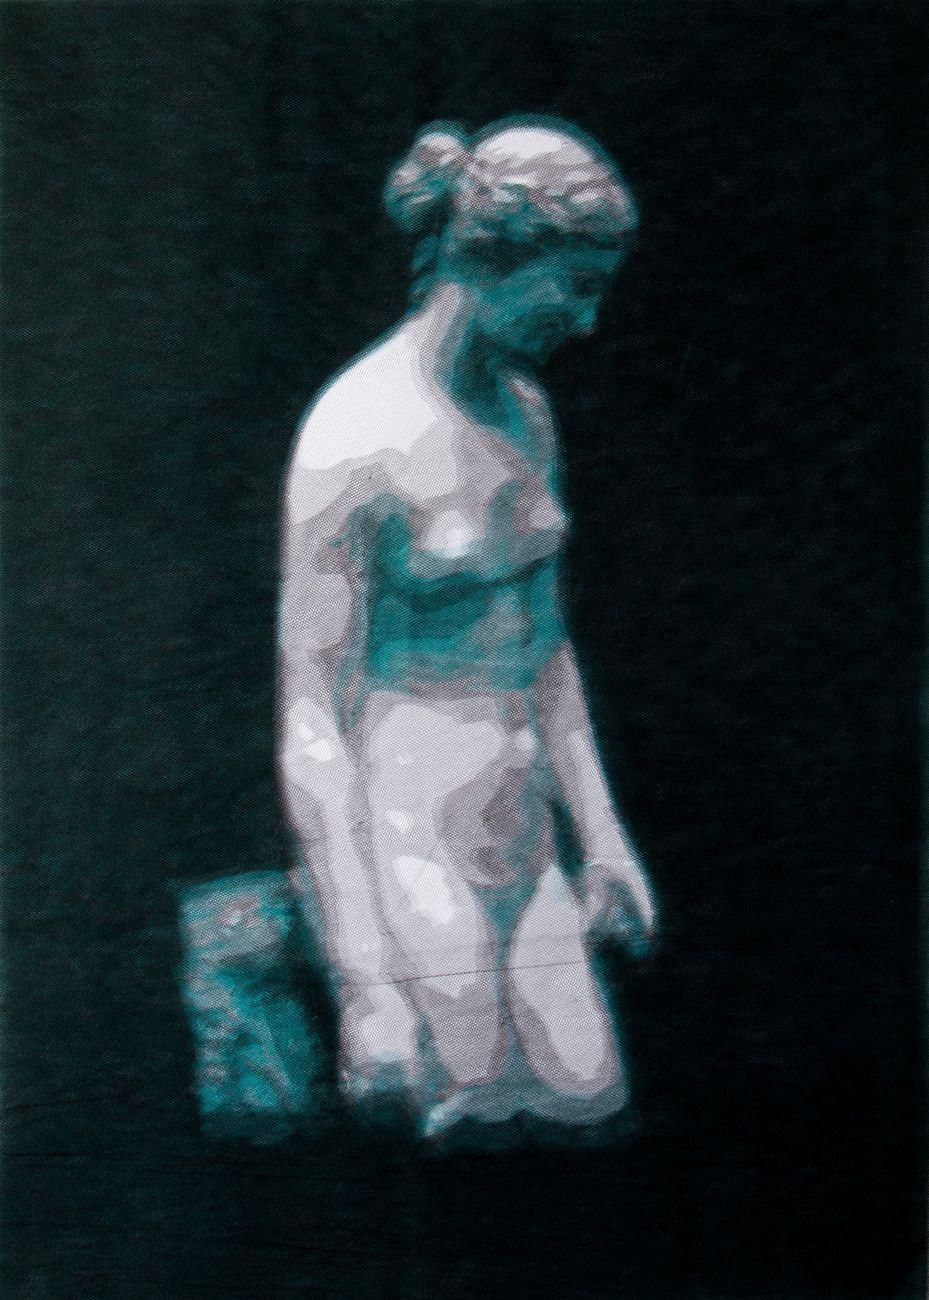 Green Clytie (Pagan Poetry), 2015, Giorgio Tentolini, Diacronie, Galleria Russo, Roma